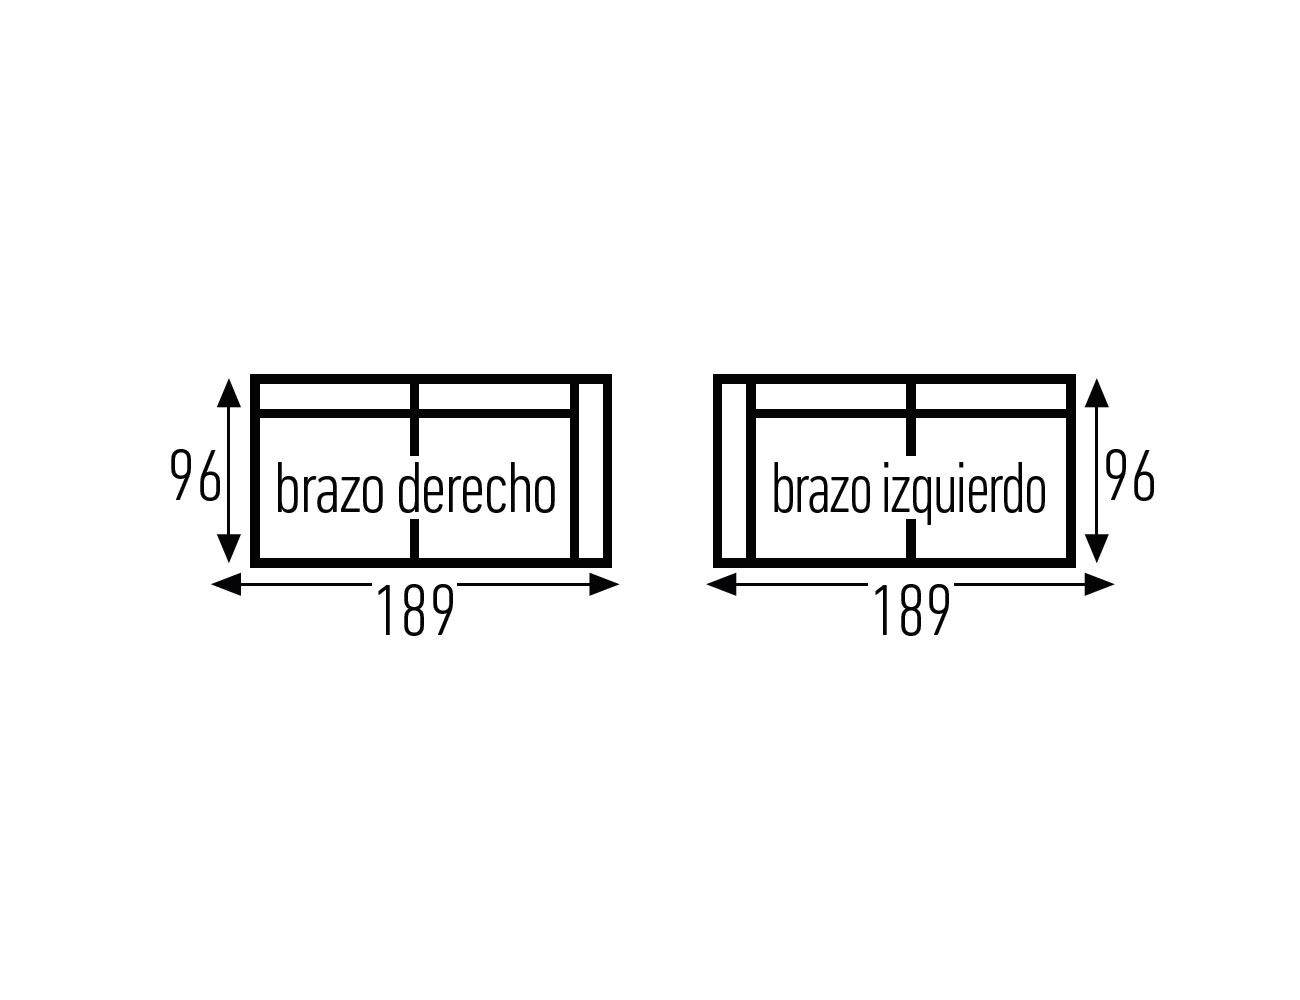 Croquis 3p sin 1 brazo 18918